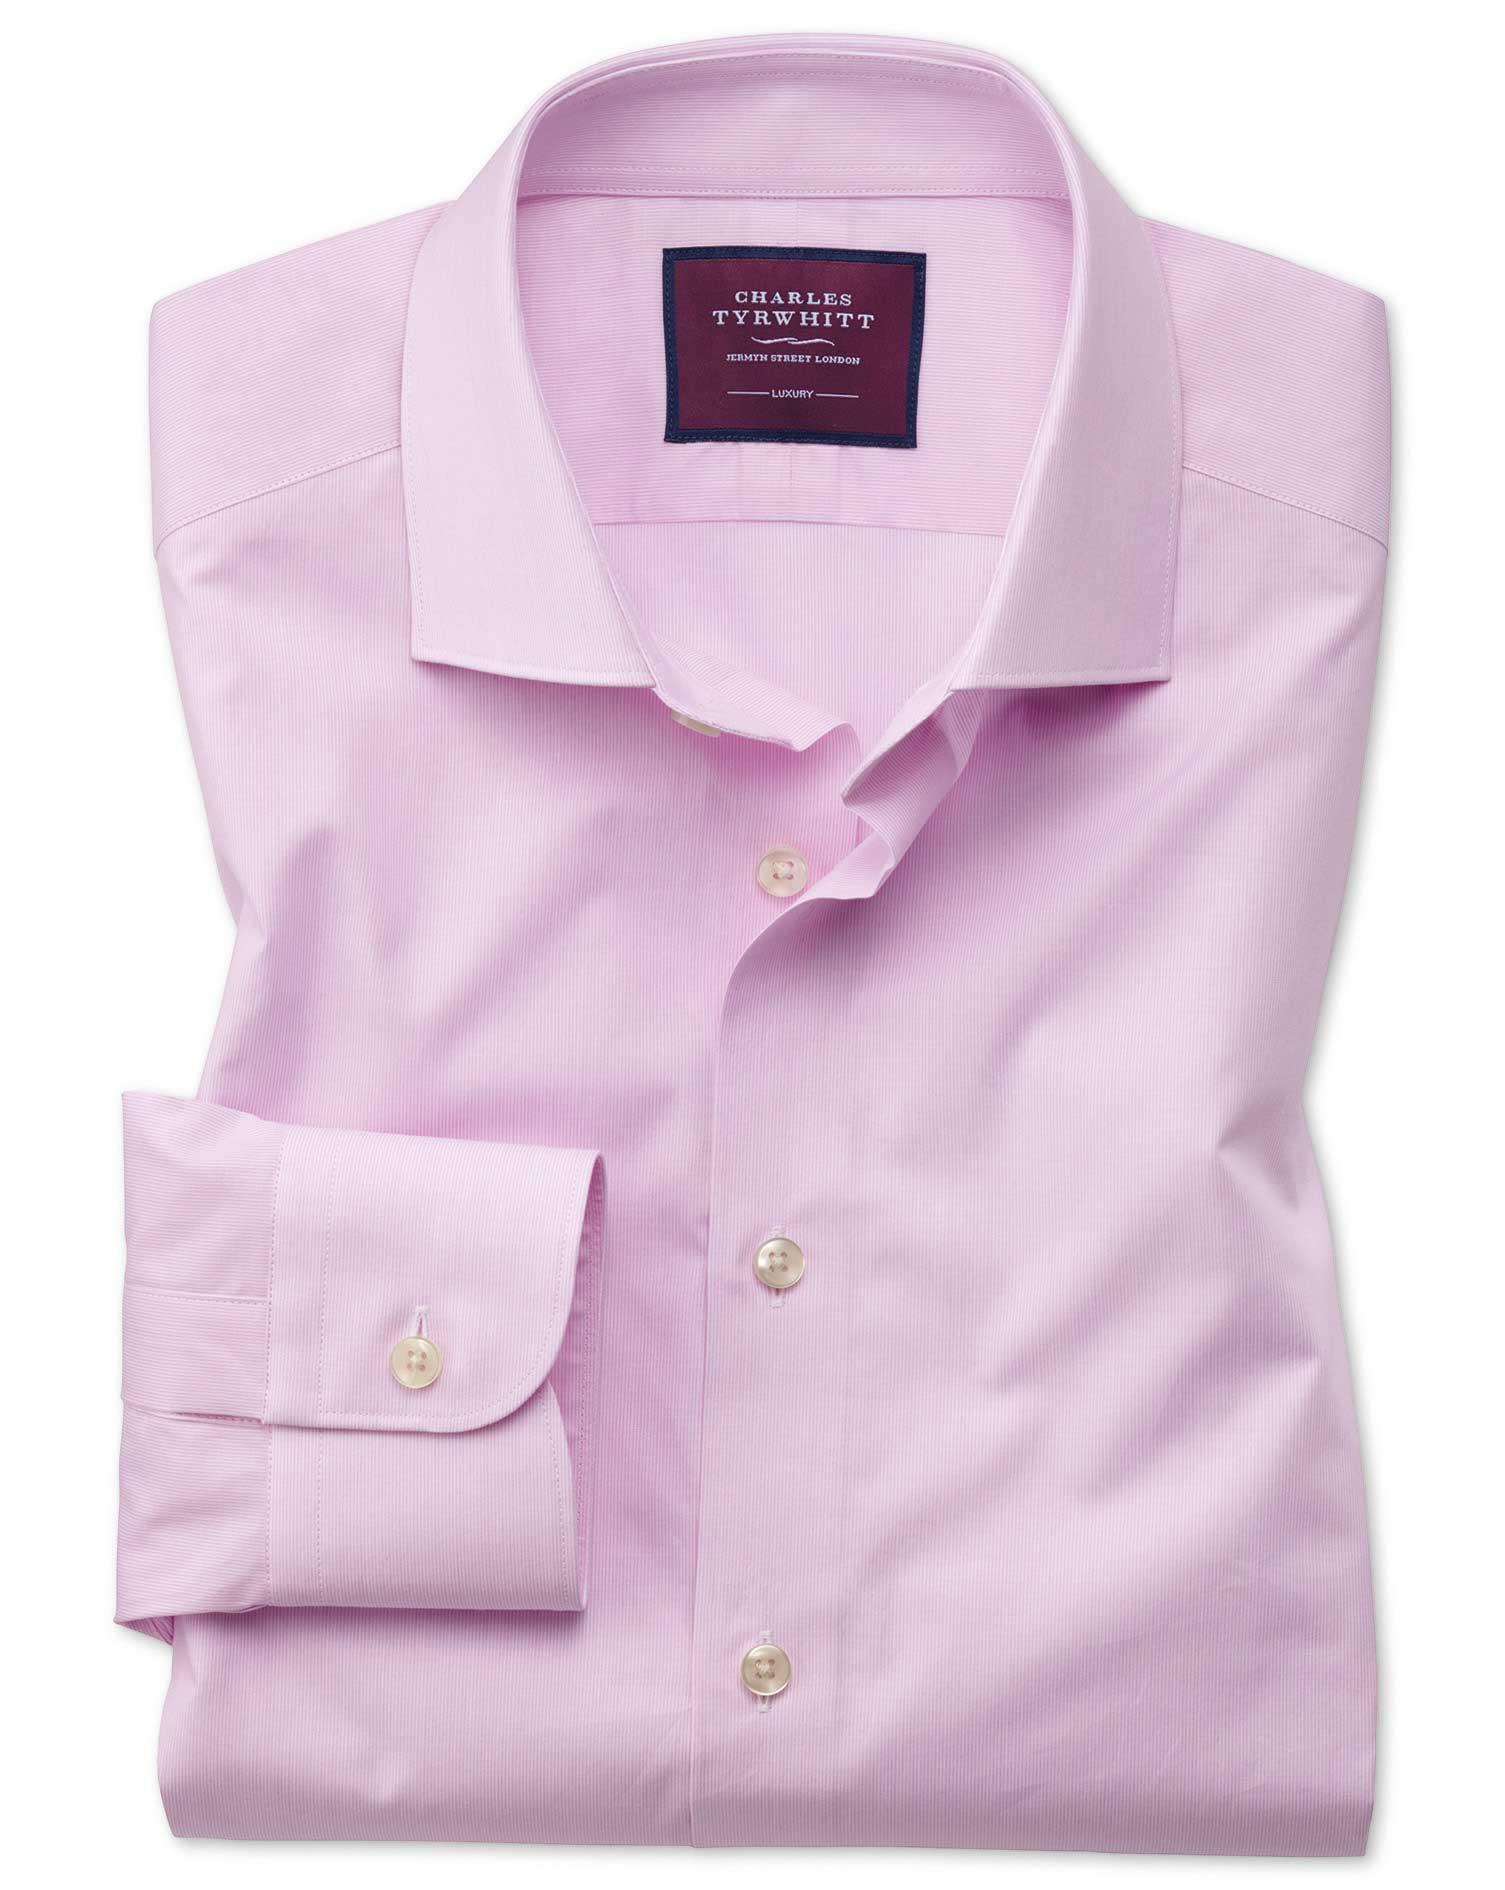 Slim Fit Pink Fine Stripe Luxury Cotton Formal Shirt Single Cuff Size 16/35 by Charles Tyrwhitt